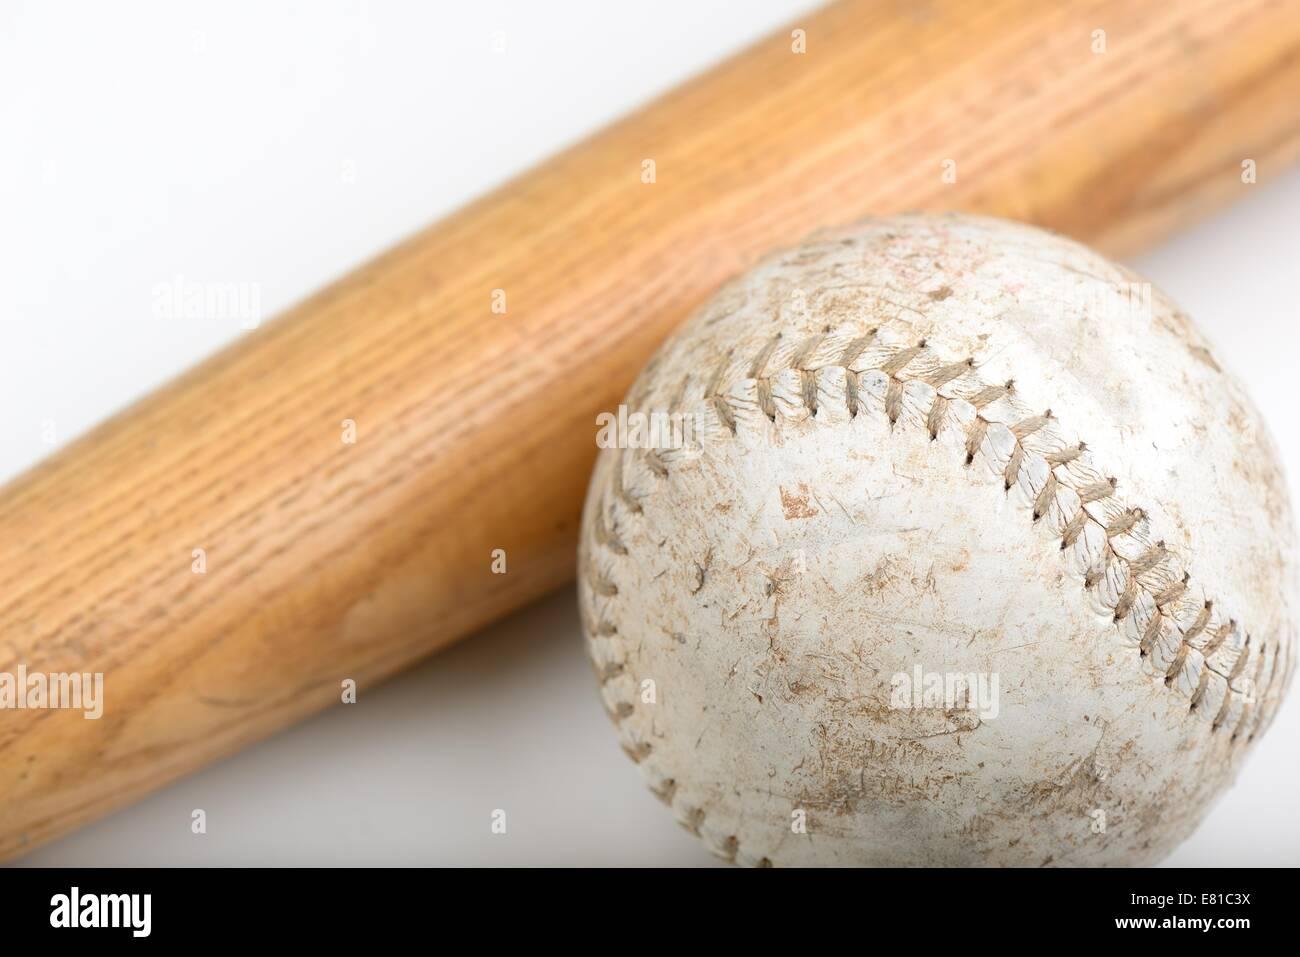 Wooden baseball bat and softball - Stock Image